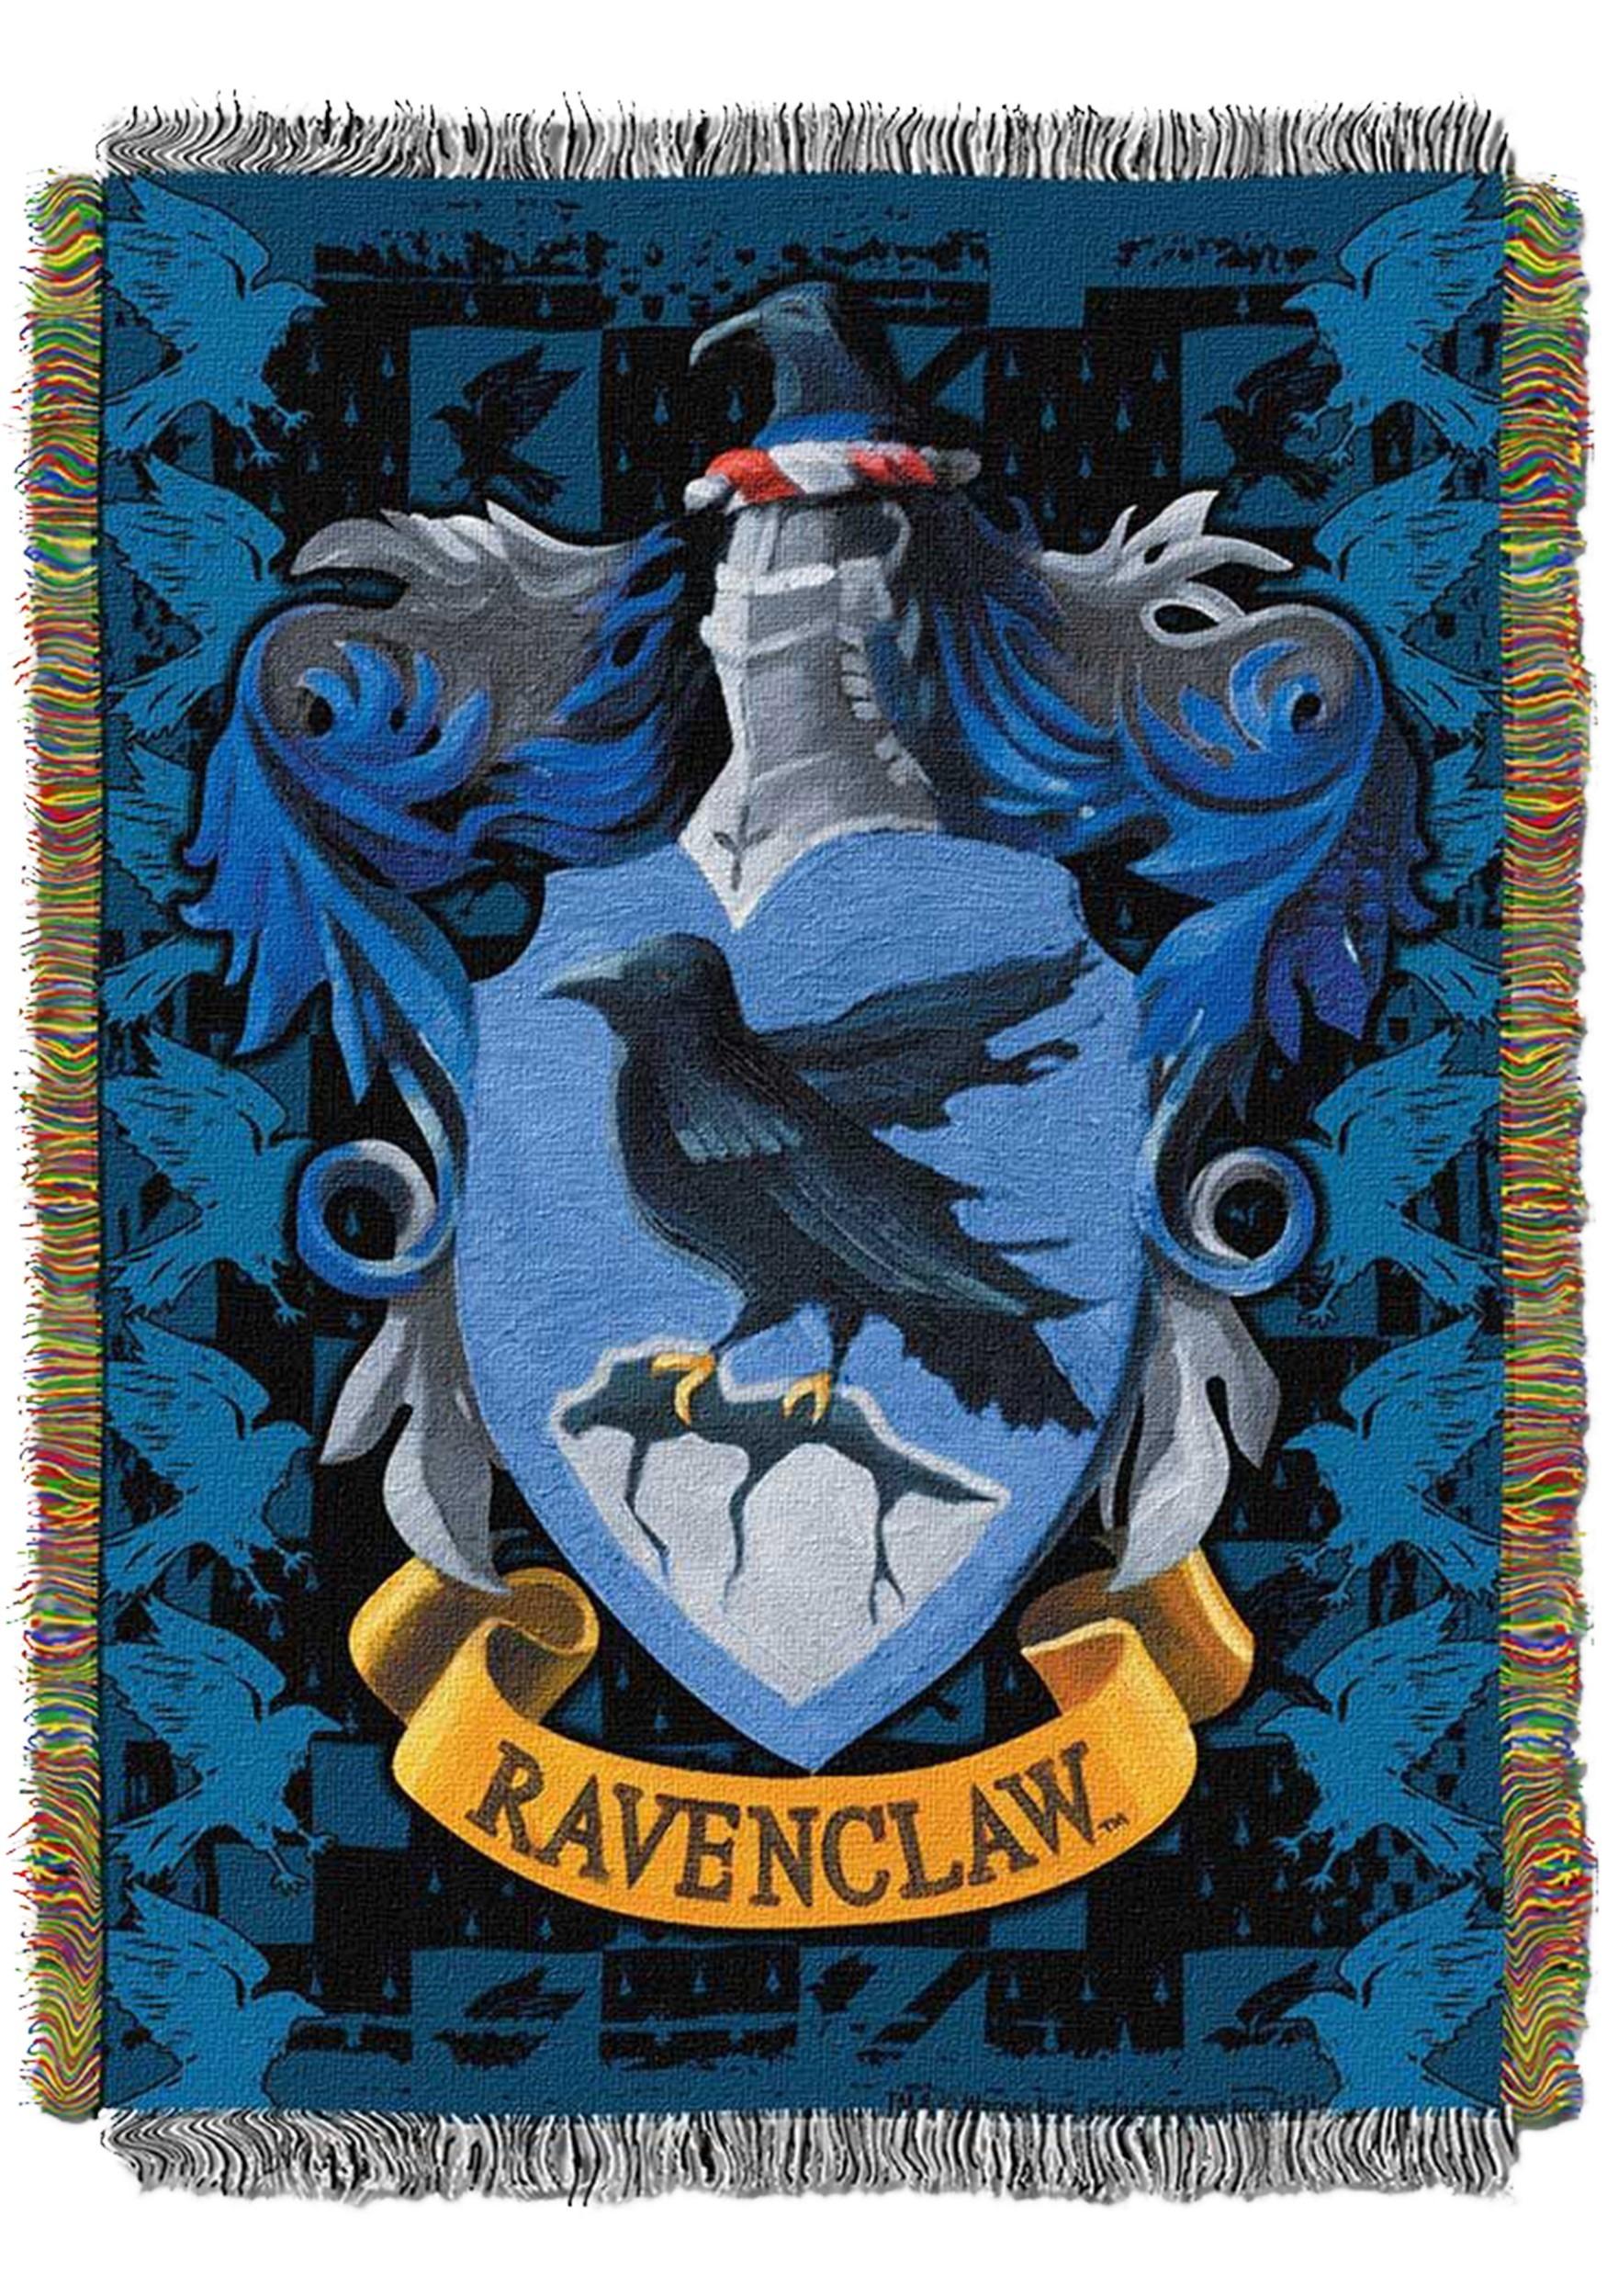 Detailed Harry Potter Ravenclaw Crest Woven Tapestry Blanket